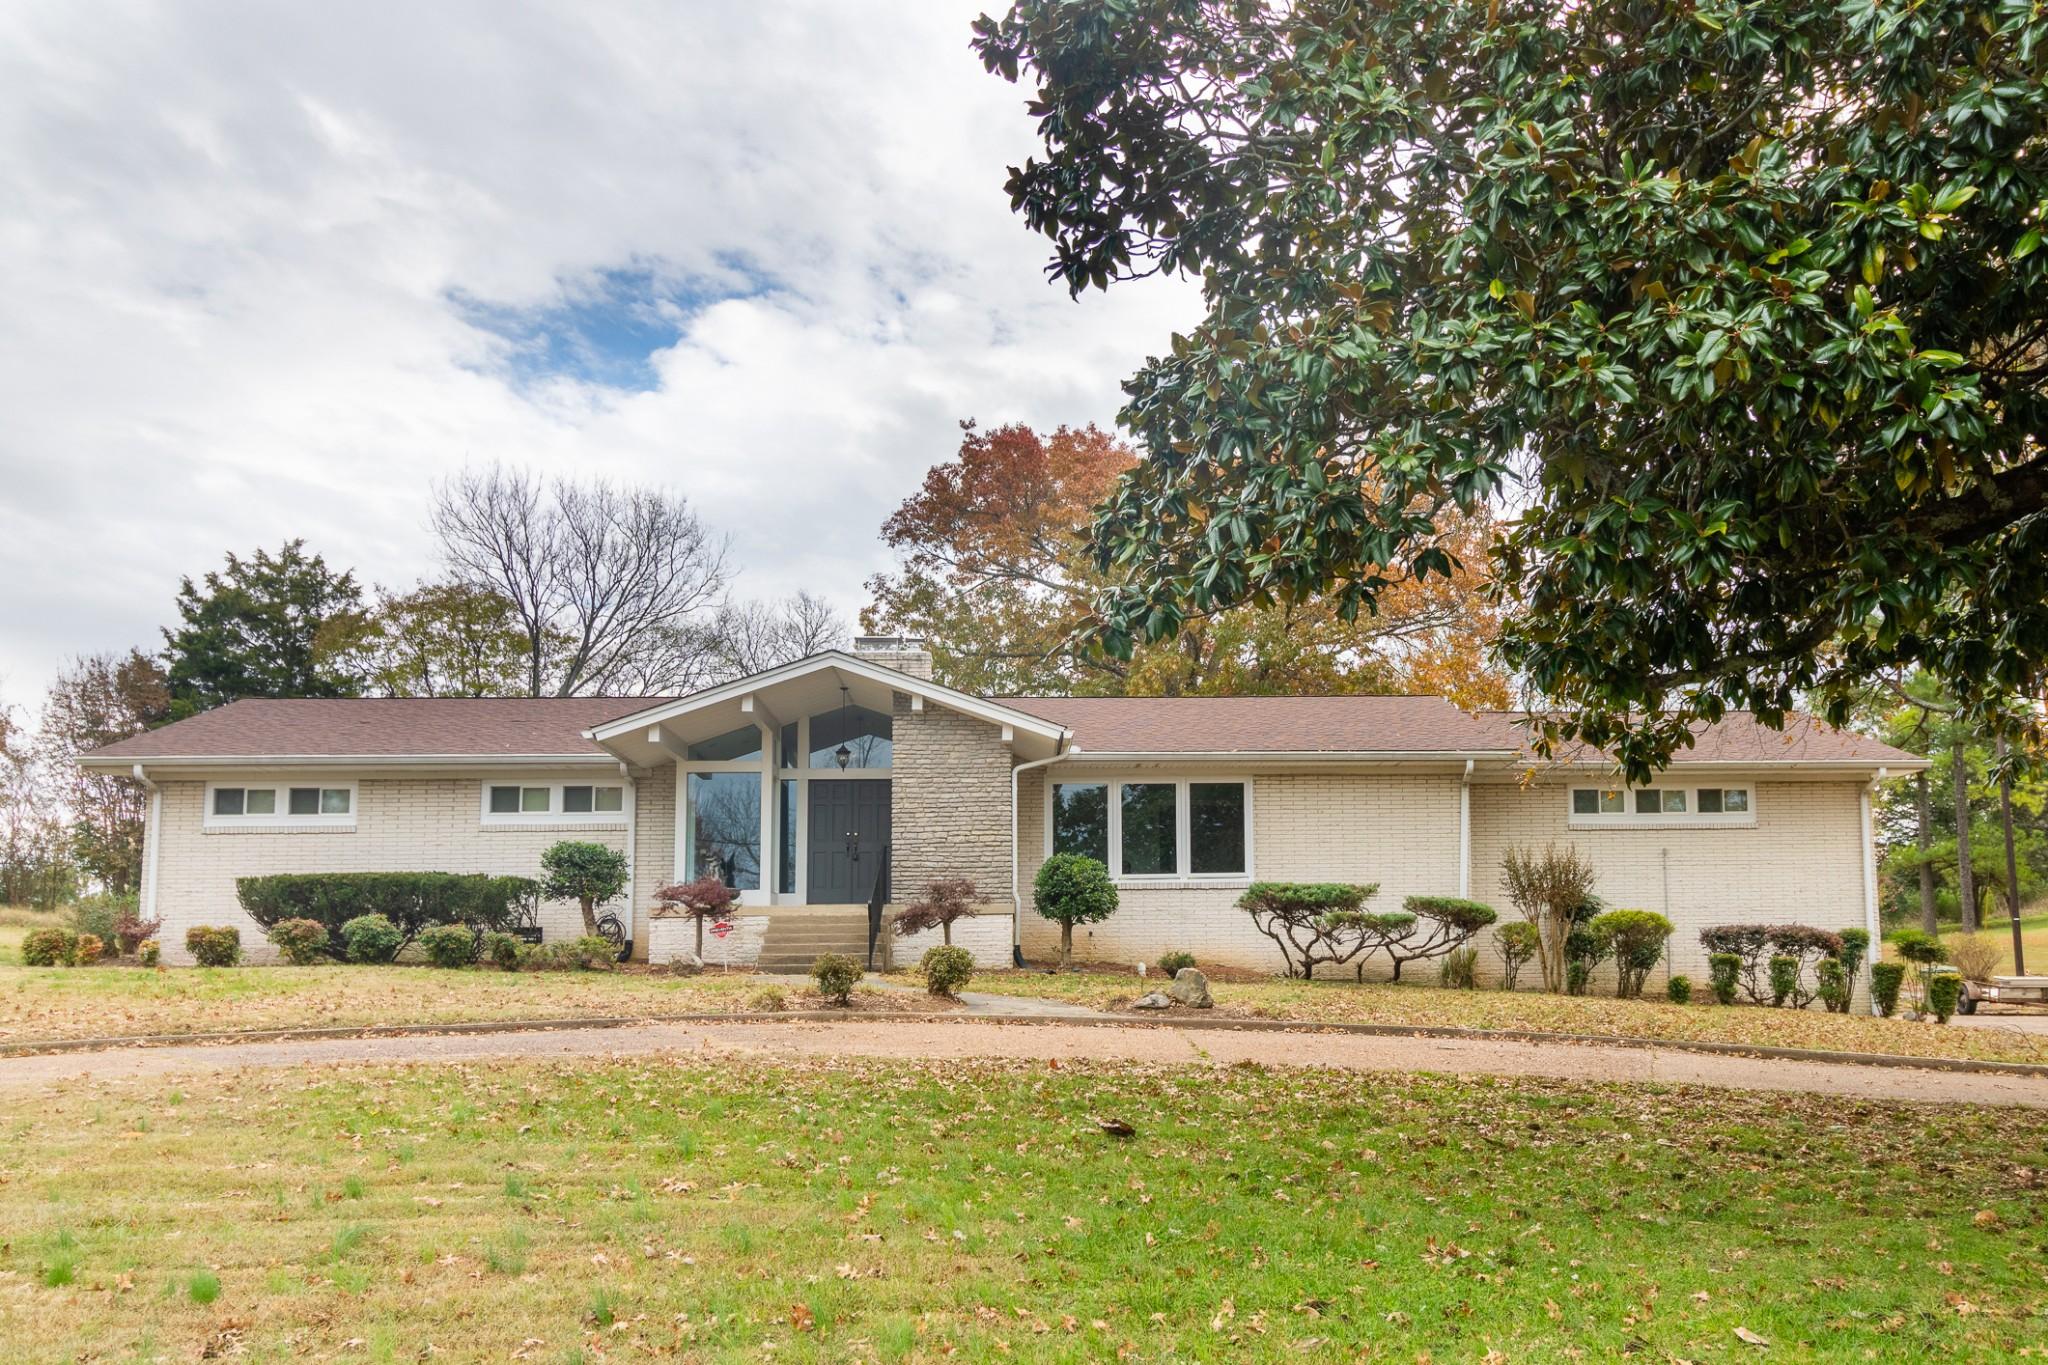 107 Oak Hill Cir, Lebanon, TN 37087 - Lebanon, TN real estate listing